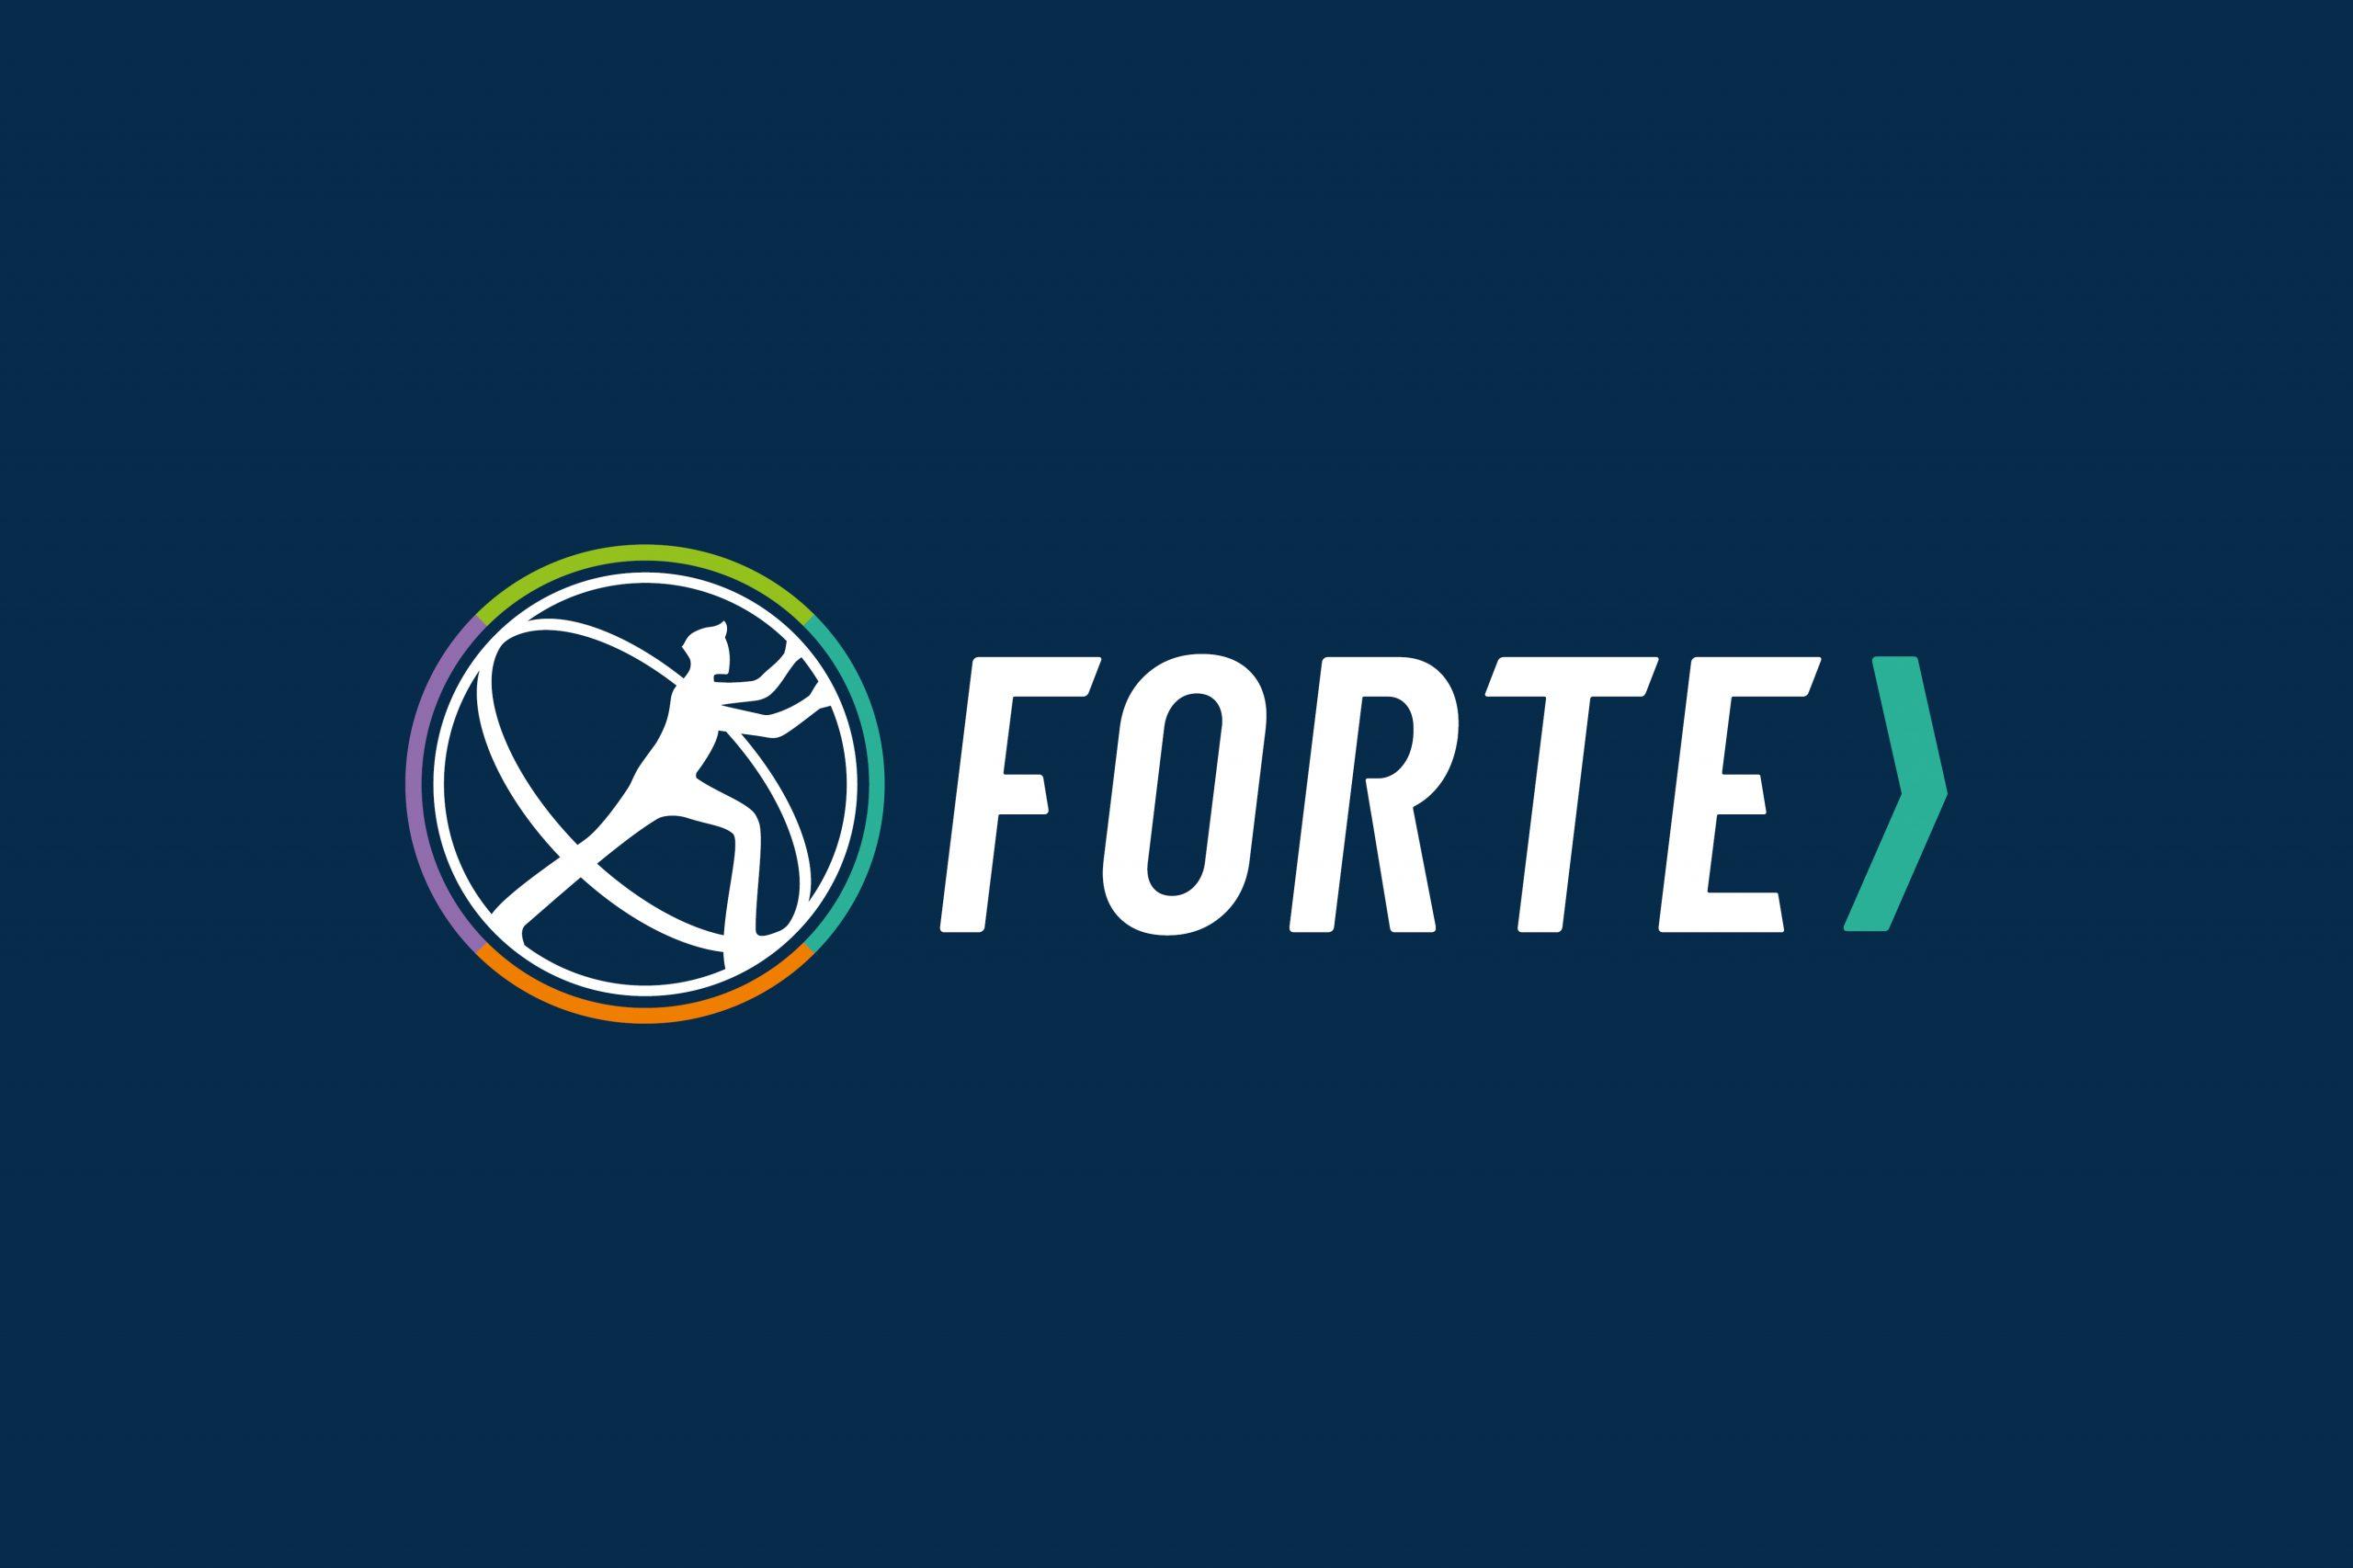 Forte_siteLumen